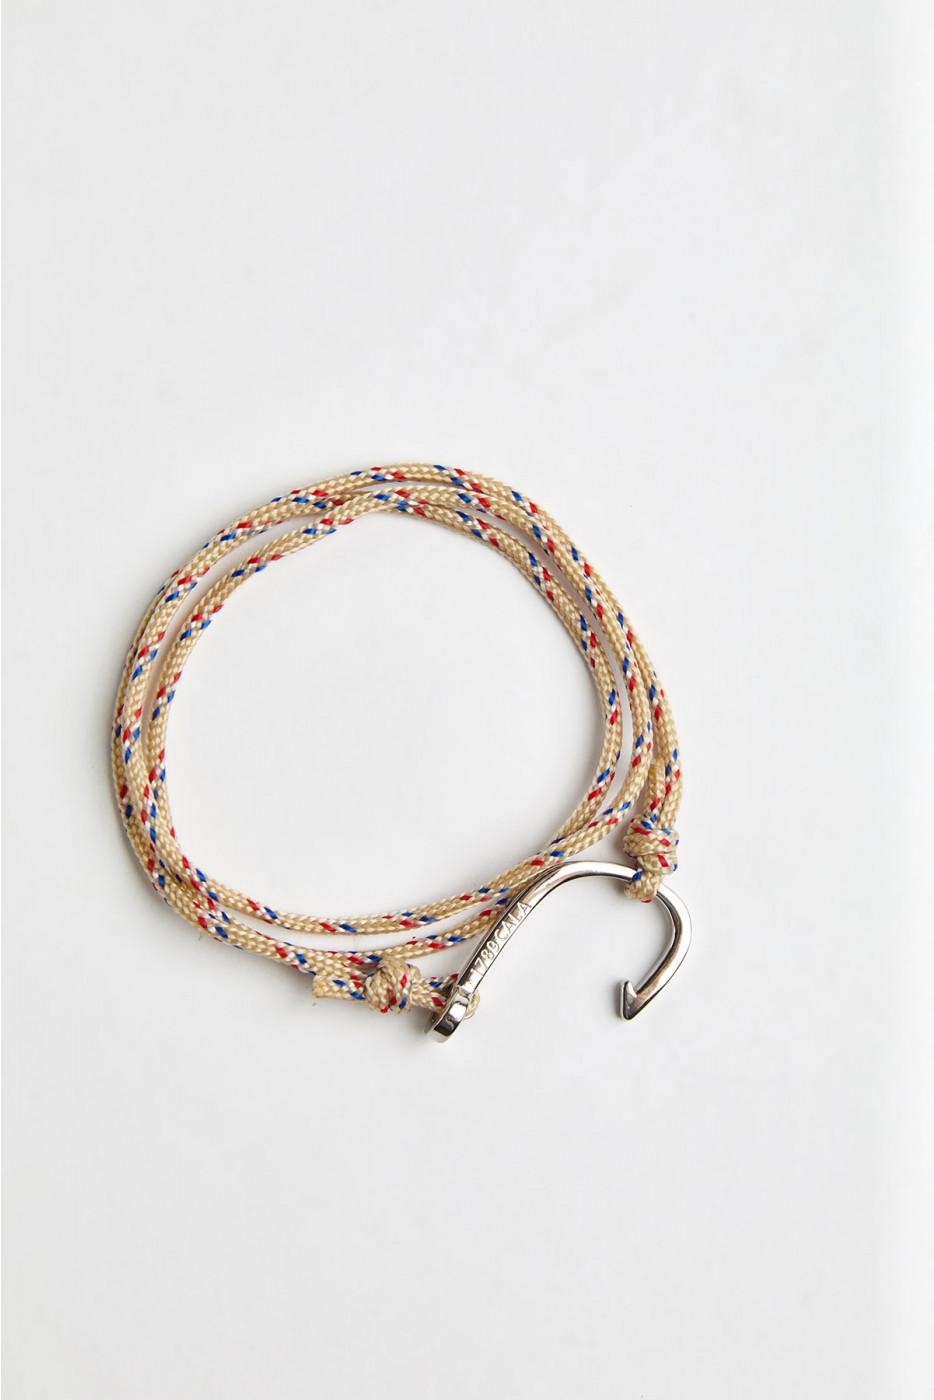 Bracelet Corde Sable - HAMEÇON BRACELET